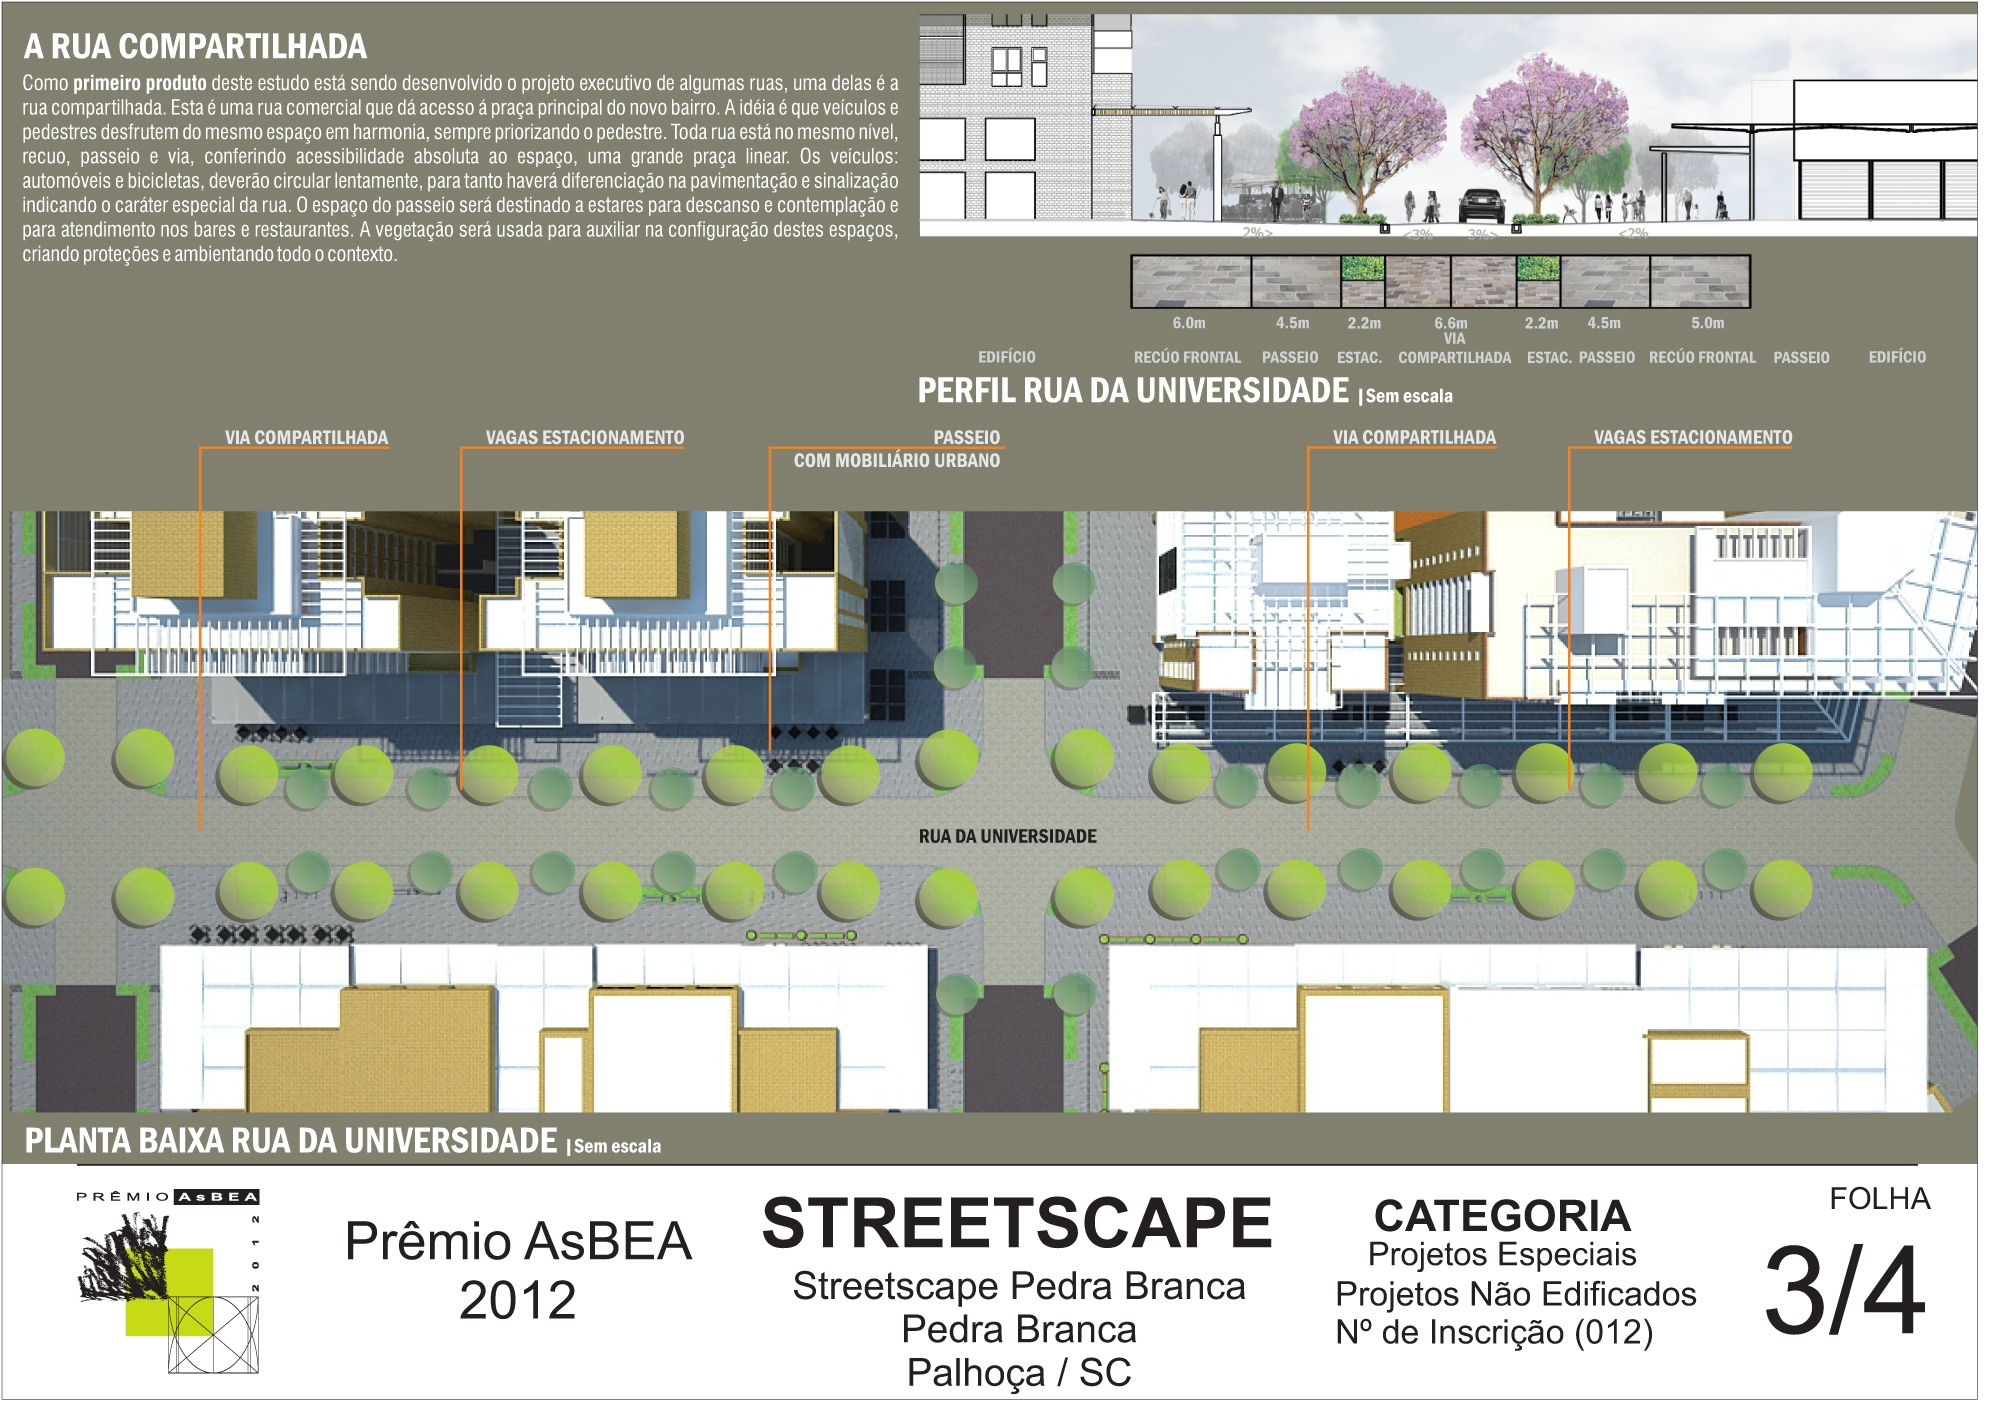 Galeria - Street Scape Pedra Branca / Jardins Arquitetura e Engenharia - 61